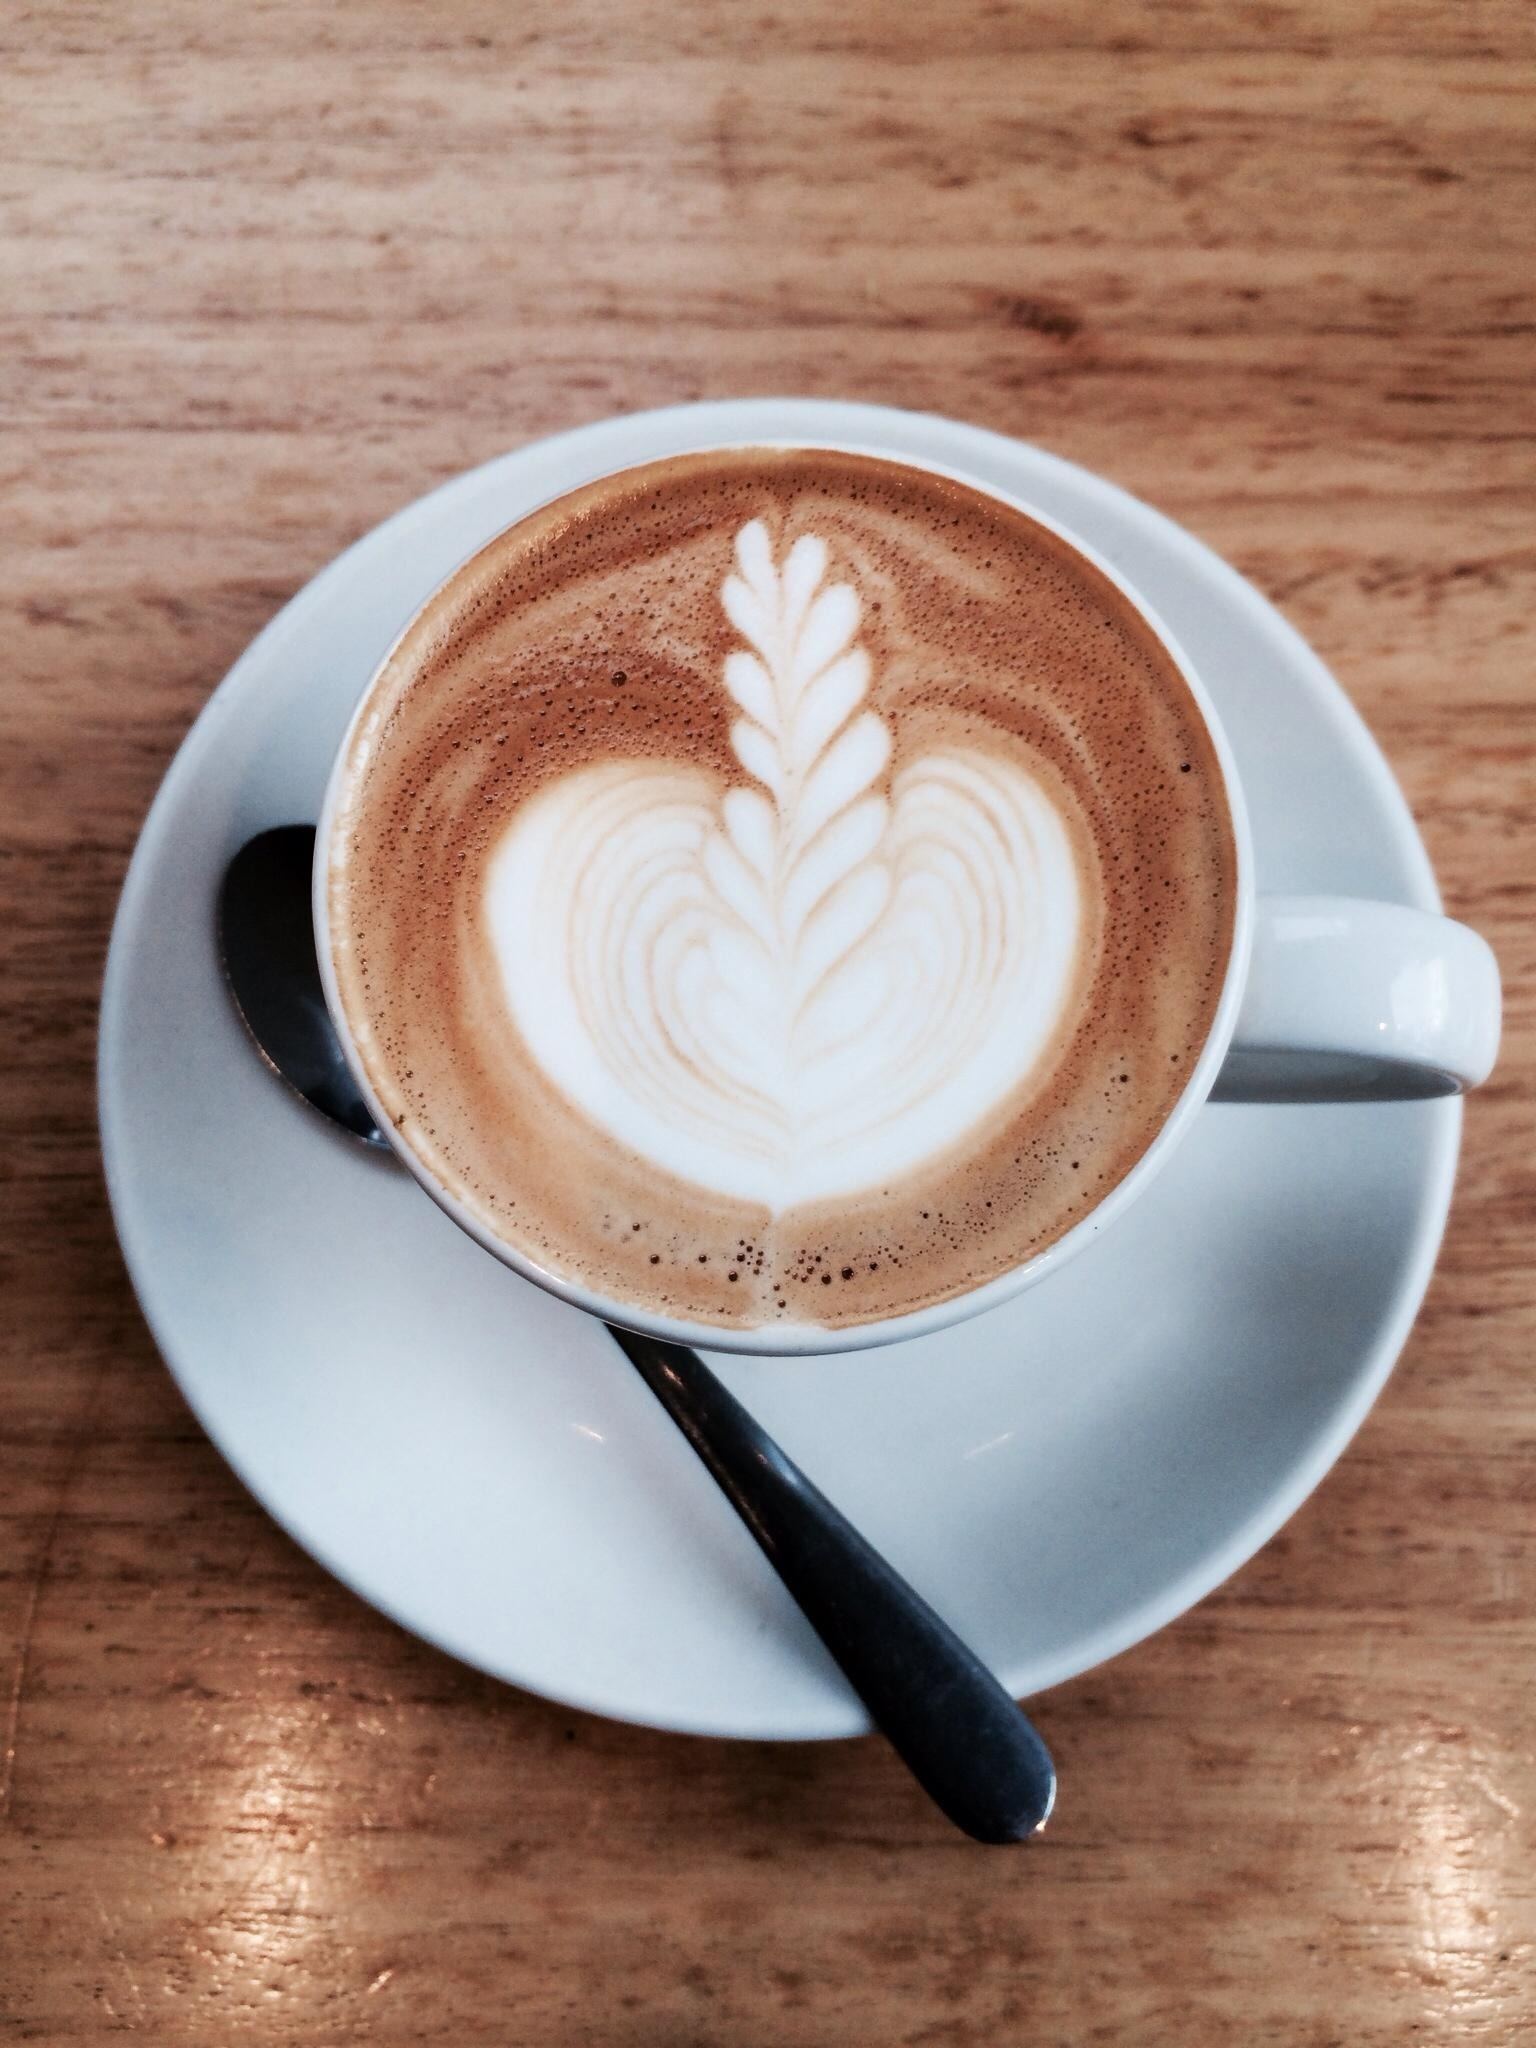 Coffee Grounds Add Nitrogen to Soil